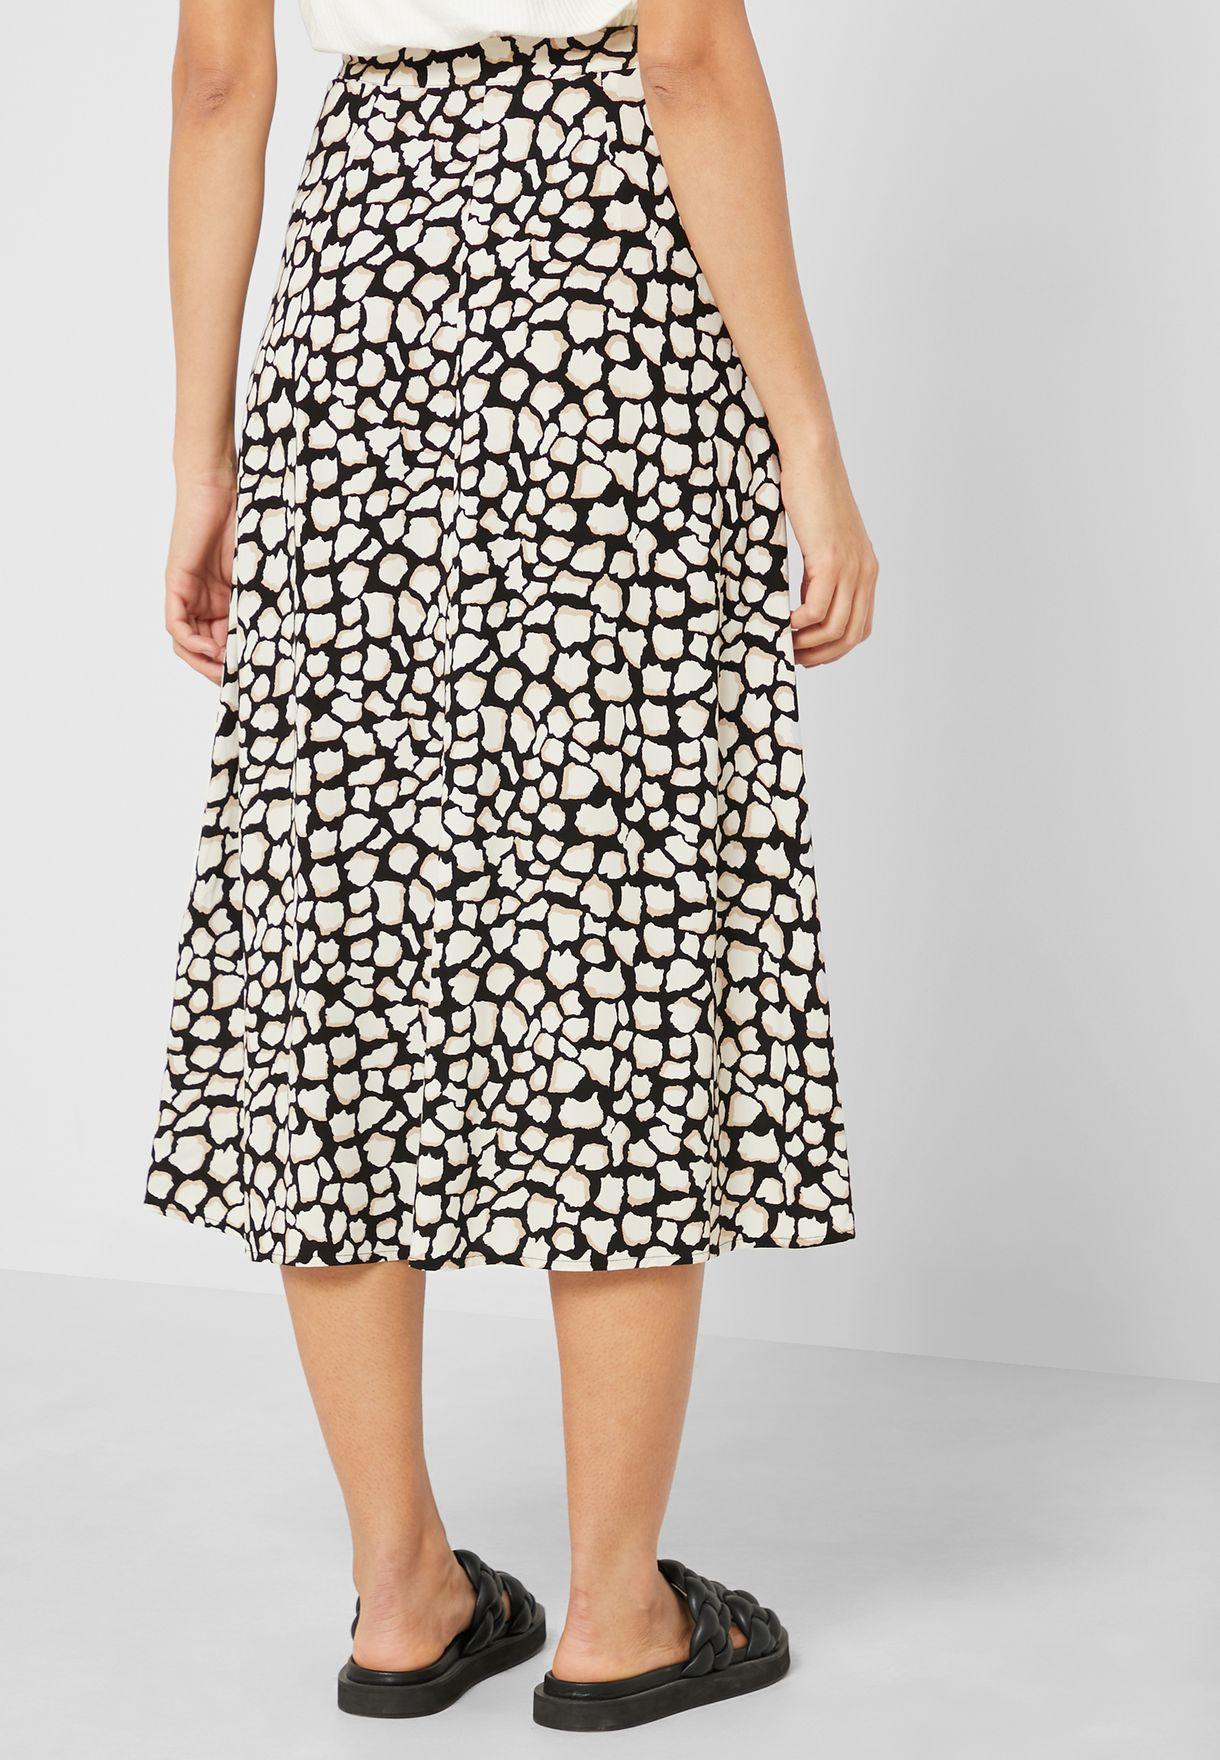 Giraffe Print Midi Skirt